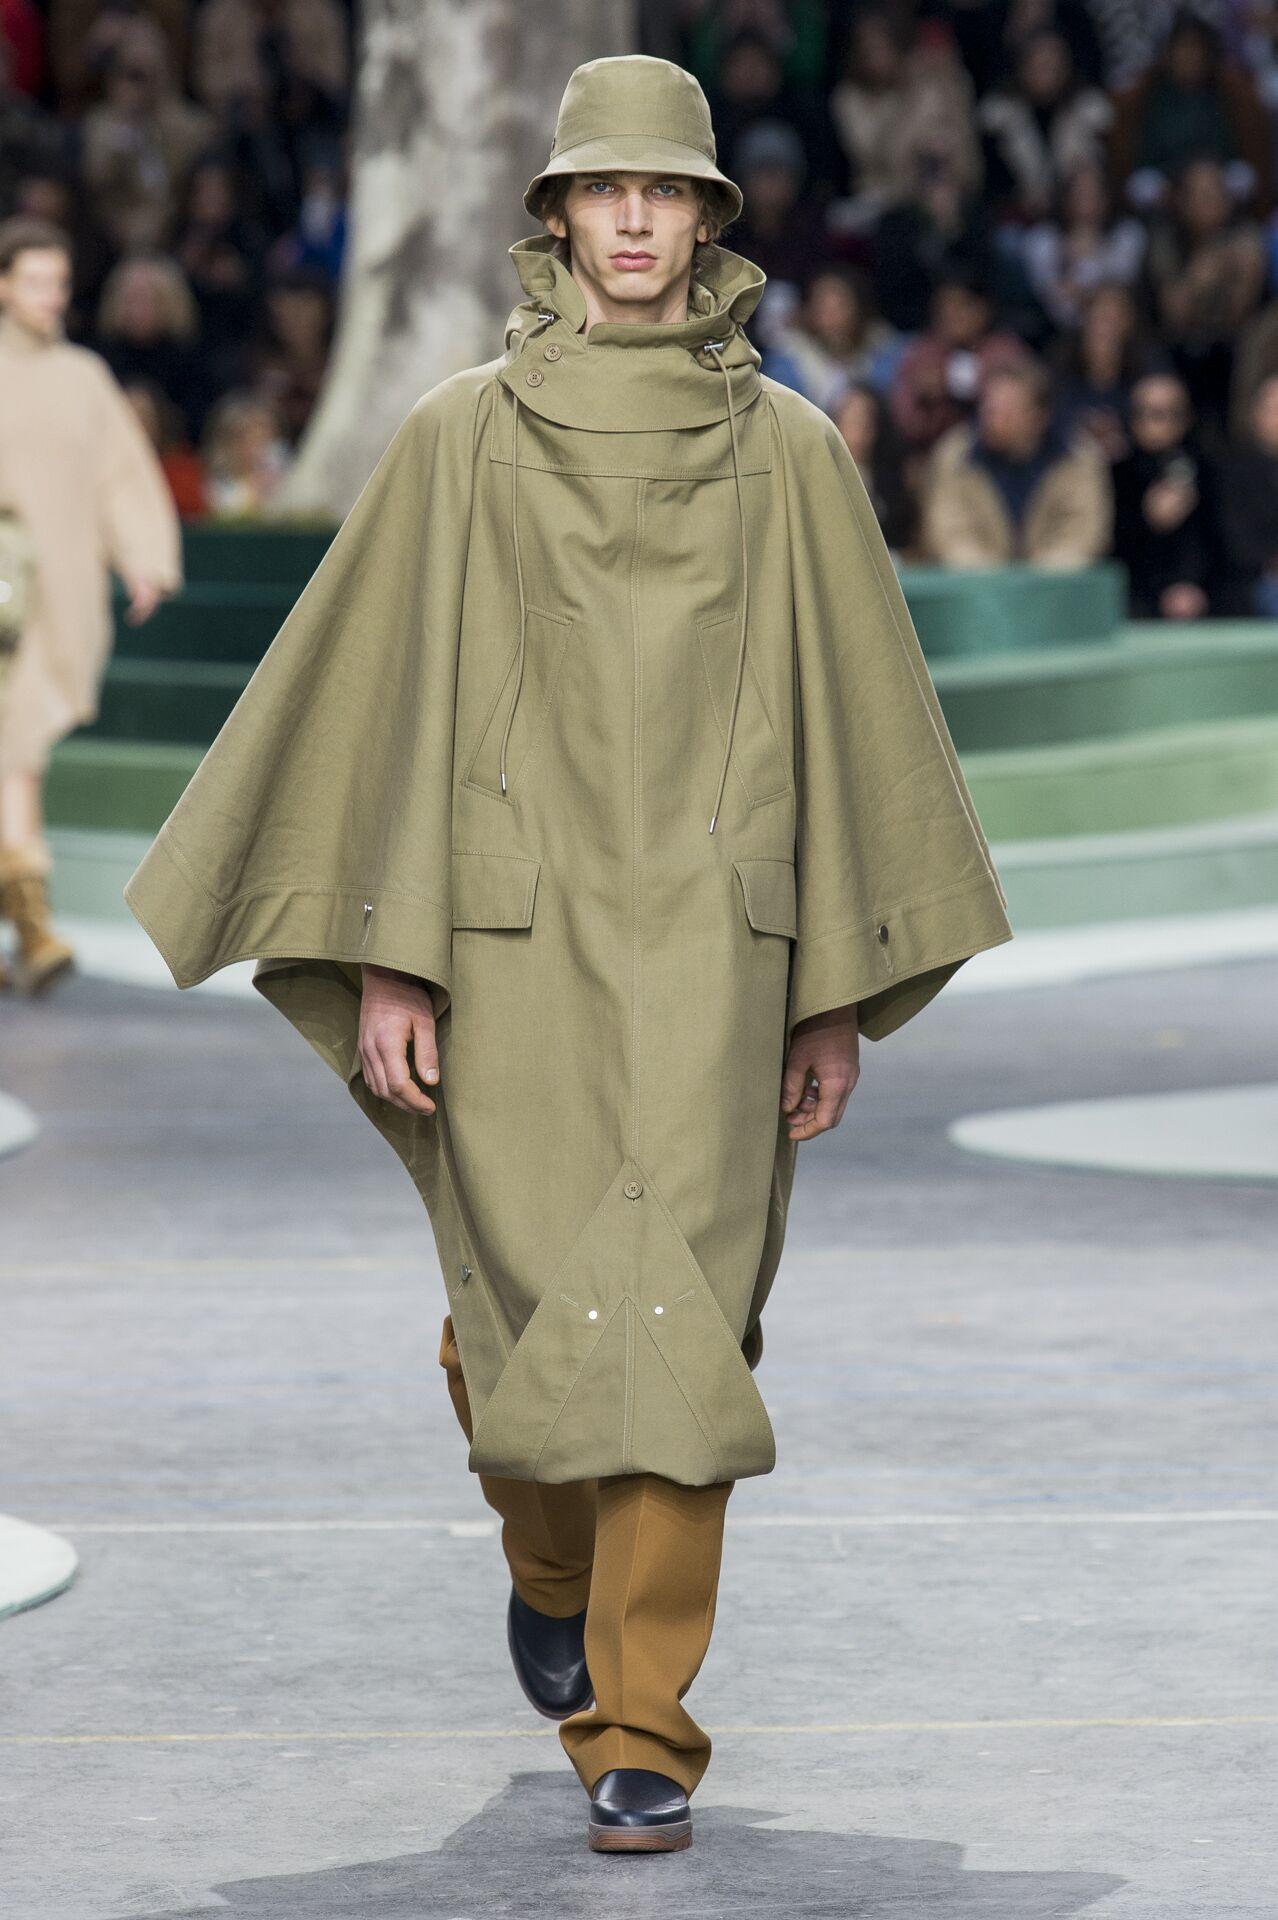 Man Model Fashion Show Lacoste